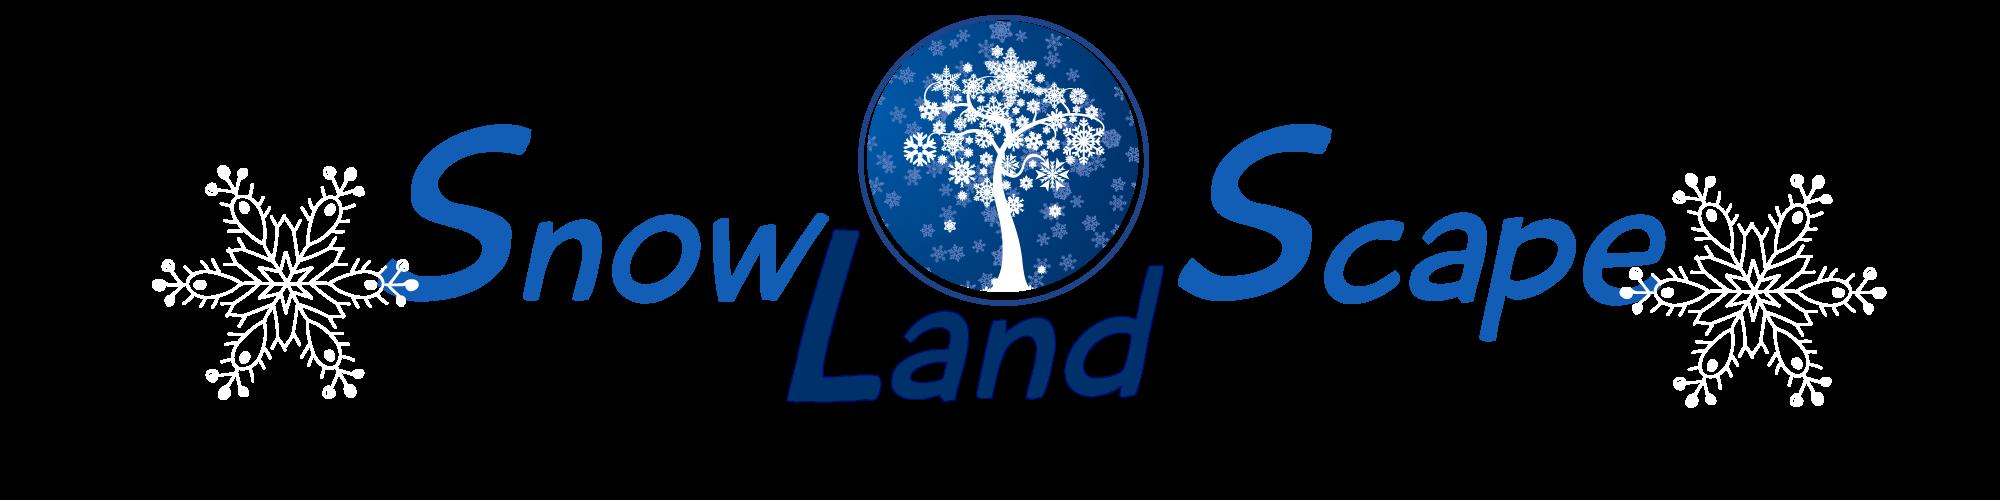 SnowLandScape-Logo